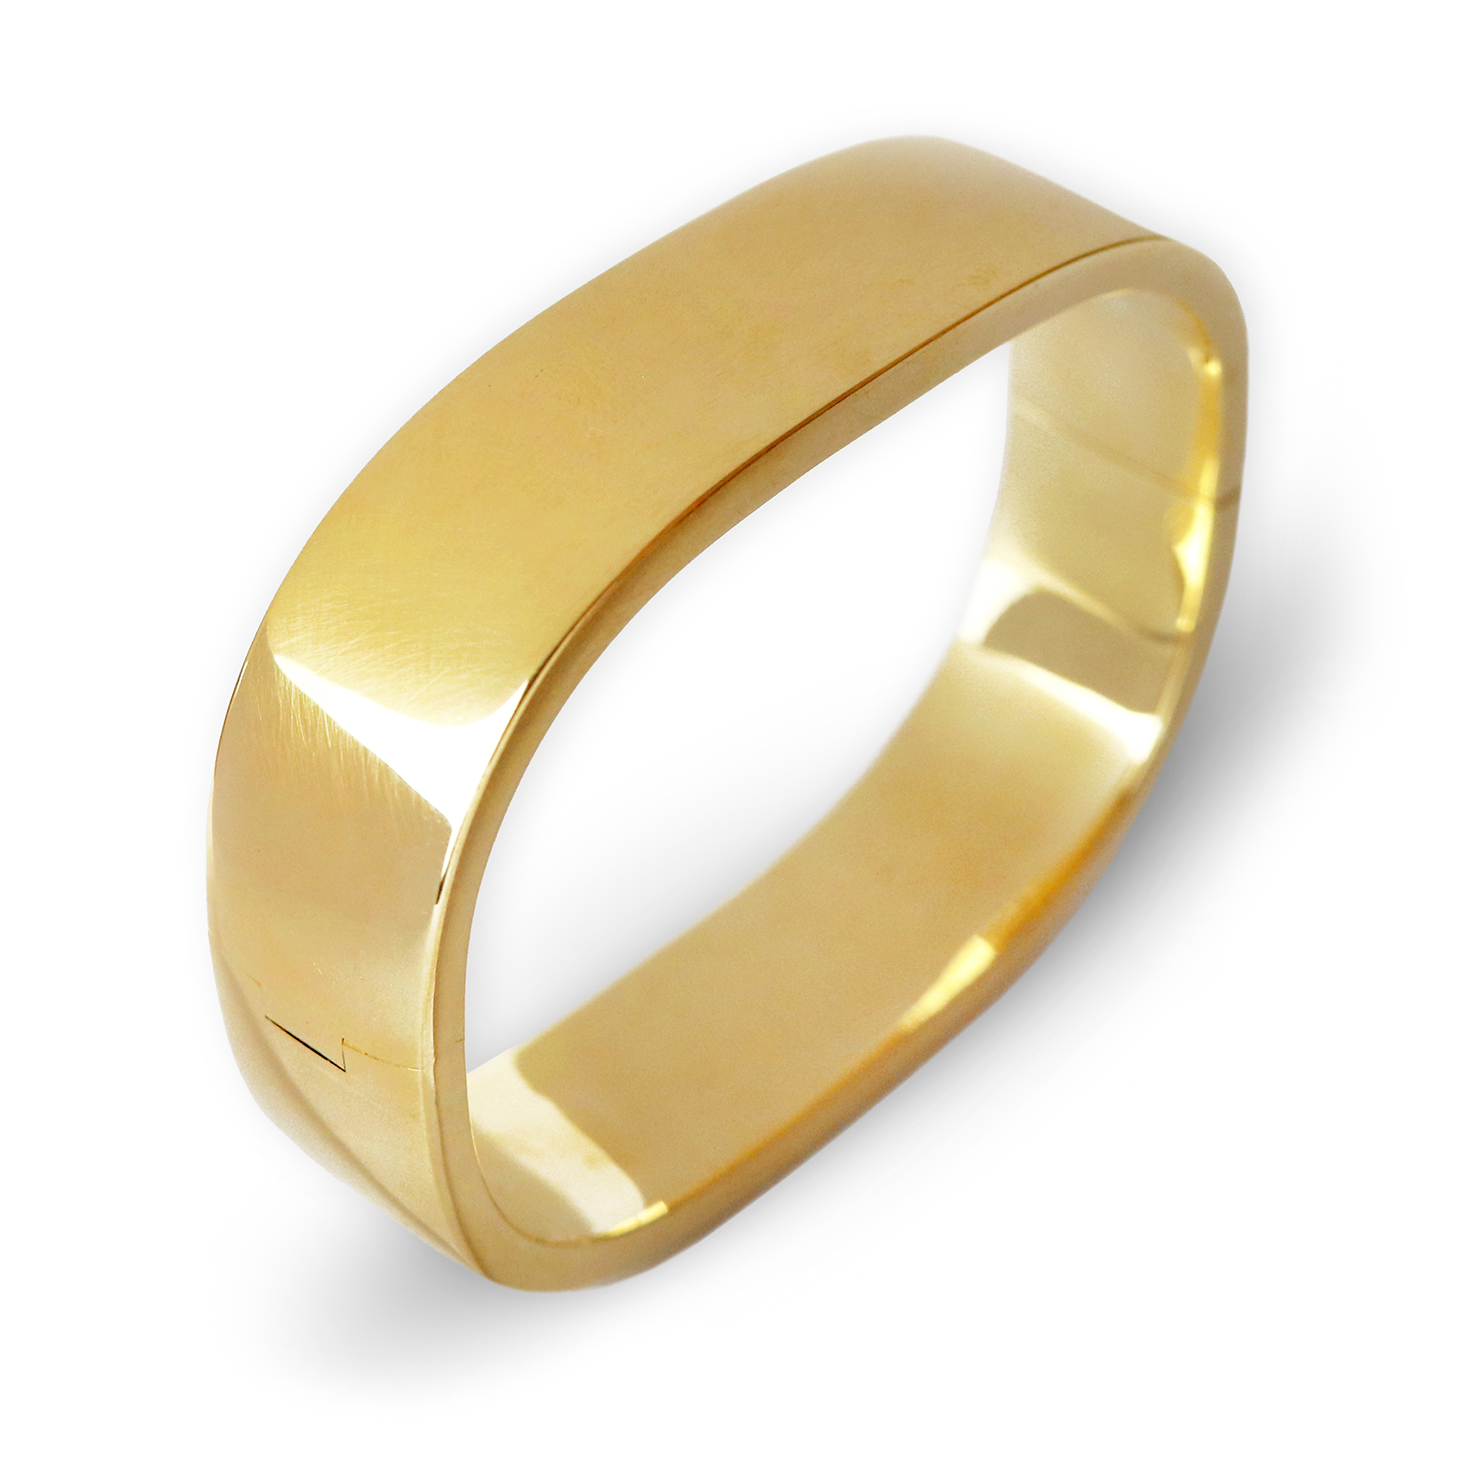 A Gold Hinged Cuff Bracelet, circa 1960